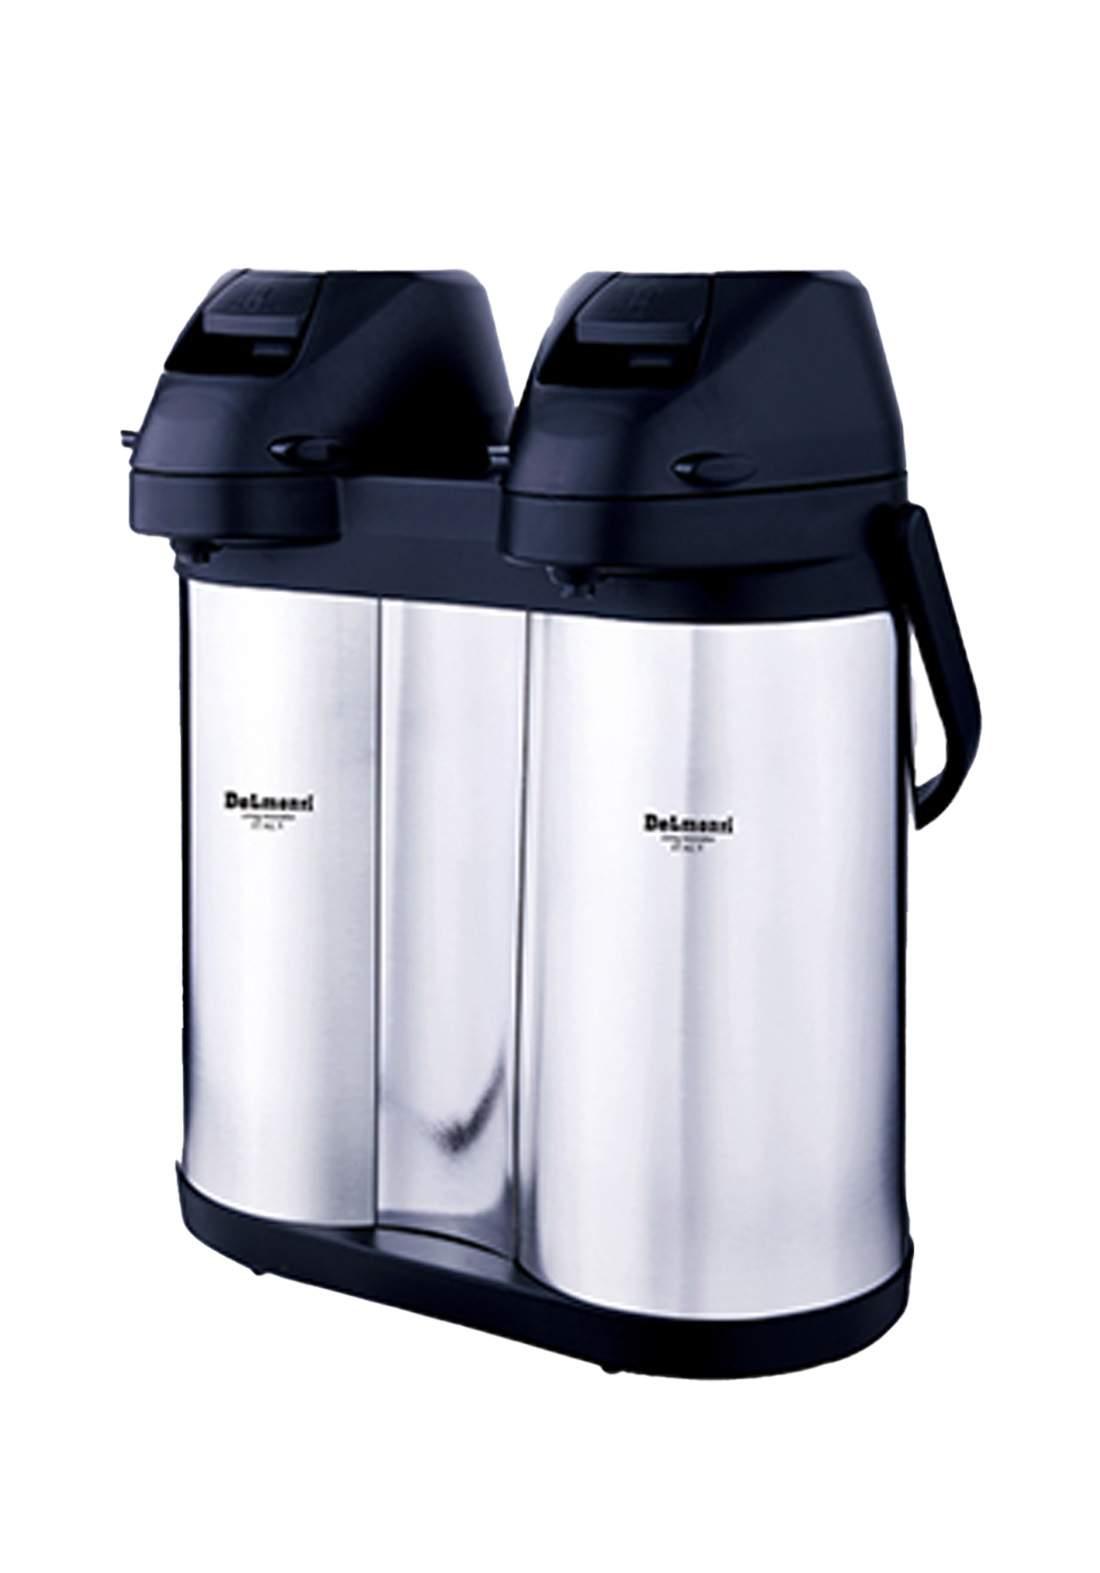 Delmonti   DL 1670 Stainless steel twin air pot  4 L ترمز حراري